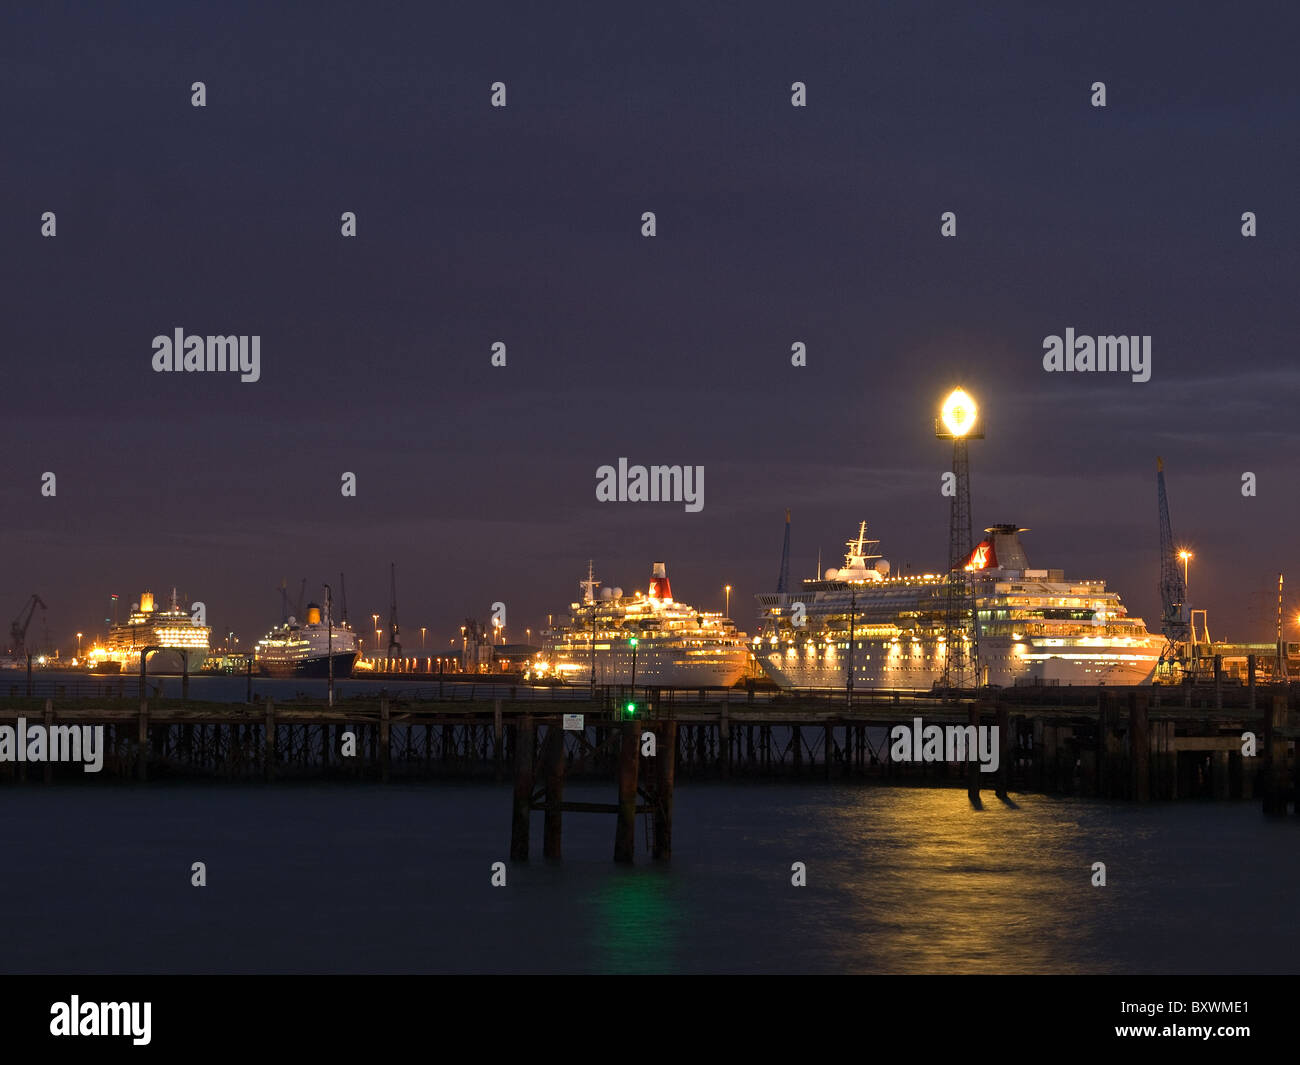 Cruise ships Balmoral (right), Black Watch, Saga Ruby and Arcadia berthed in Southampton England UK early morning - Stock Image